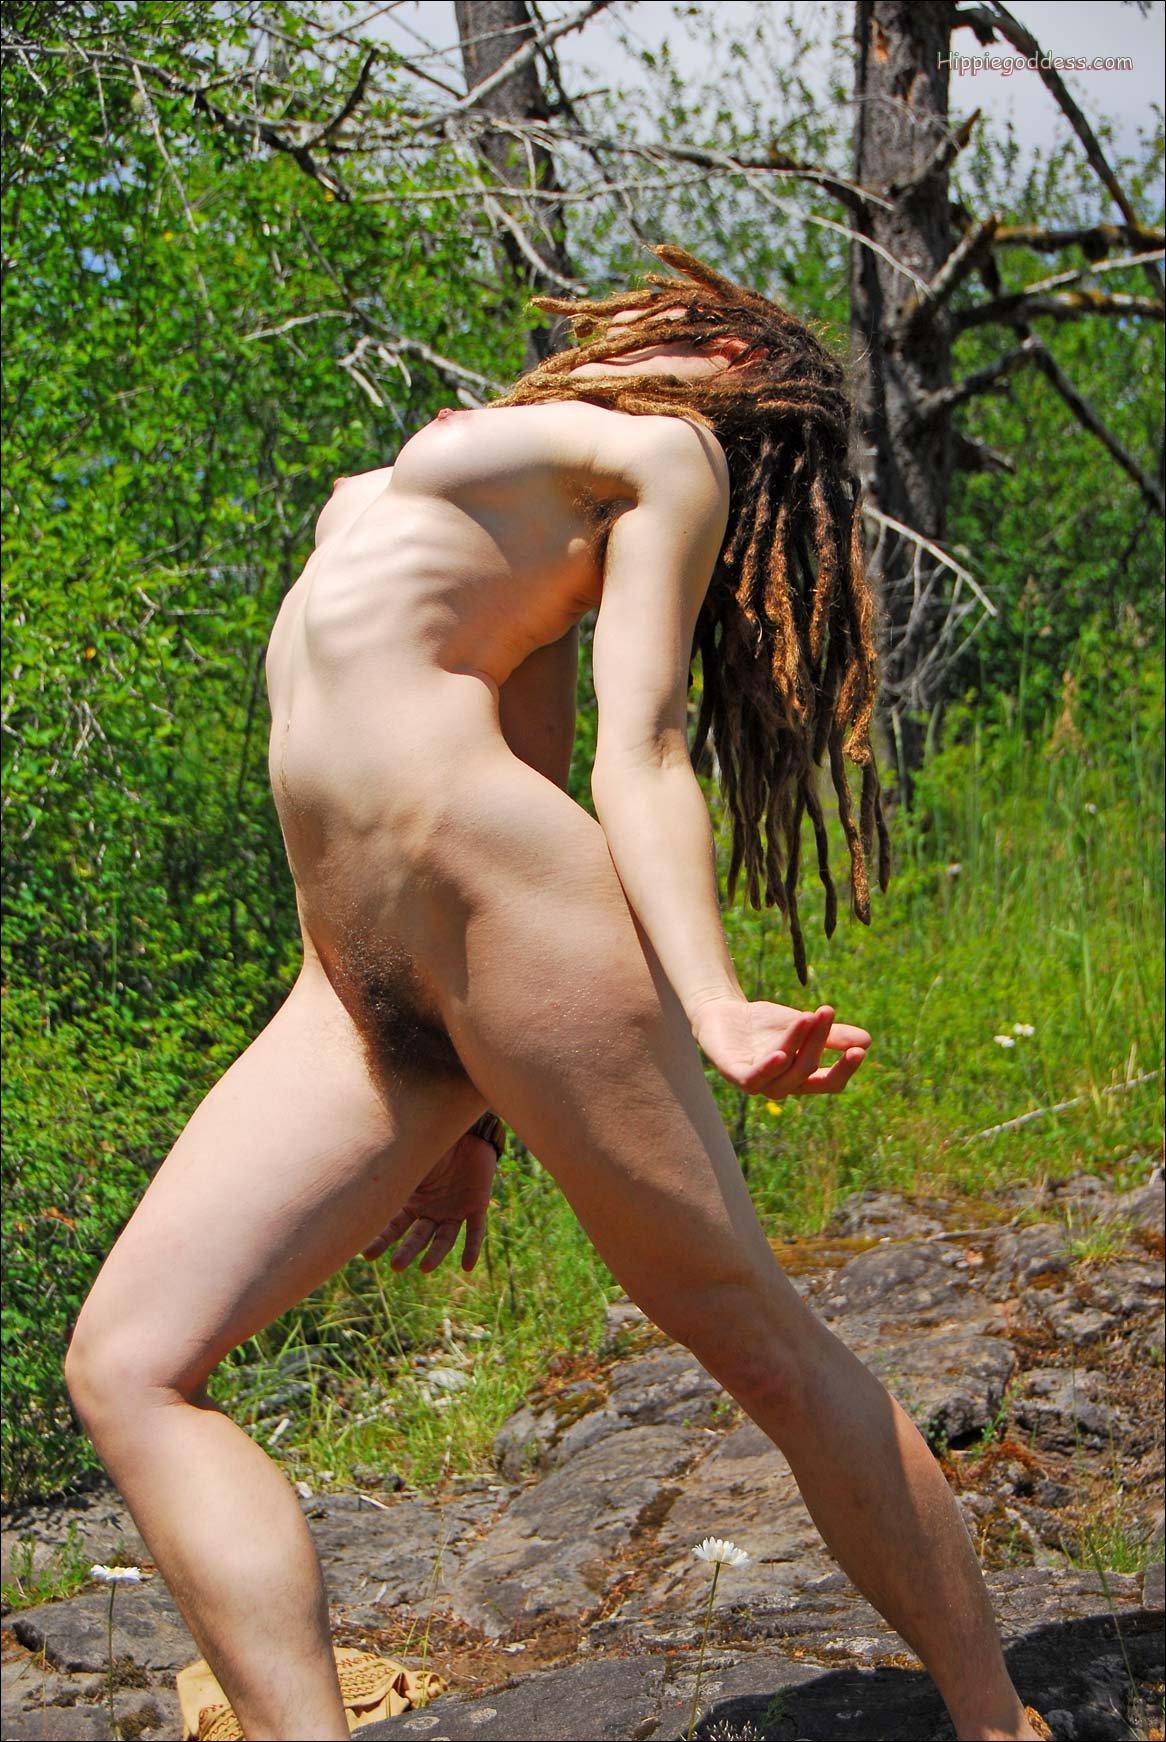 With nude dreadlocks girls hippie